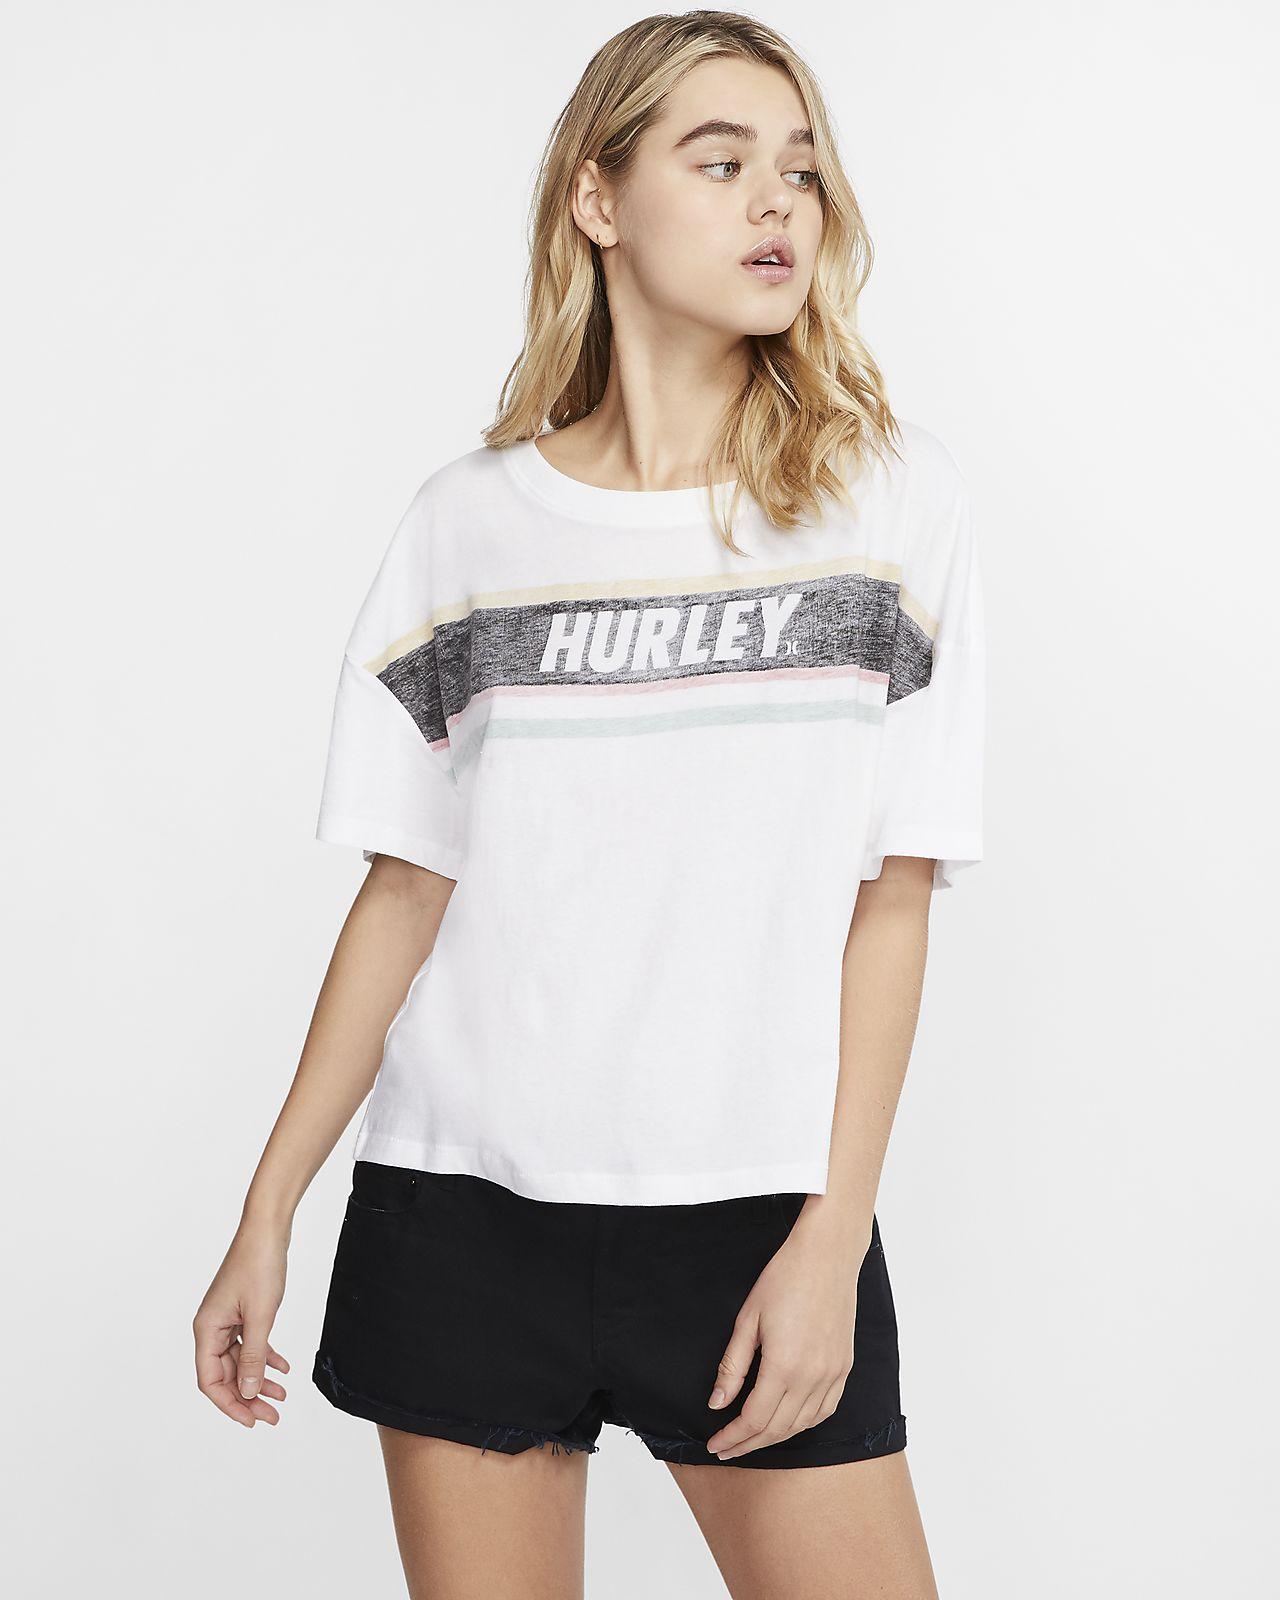 Hurley Sporty Stripes Flouncy Women's T-Shirt